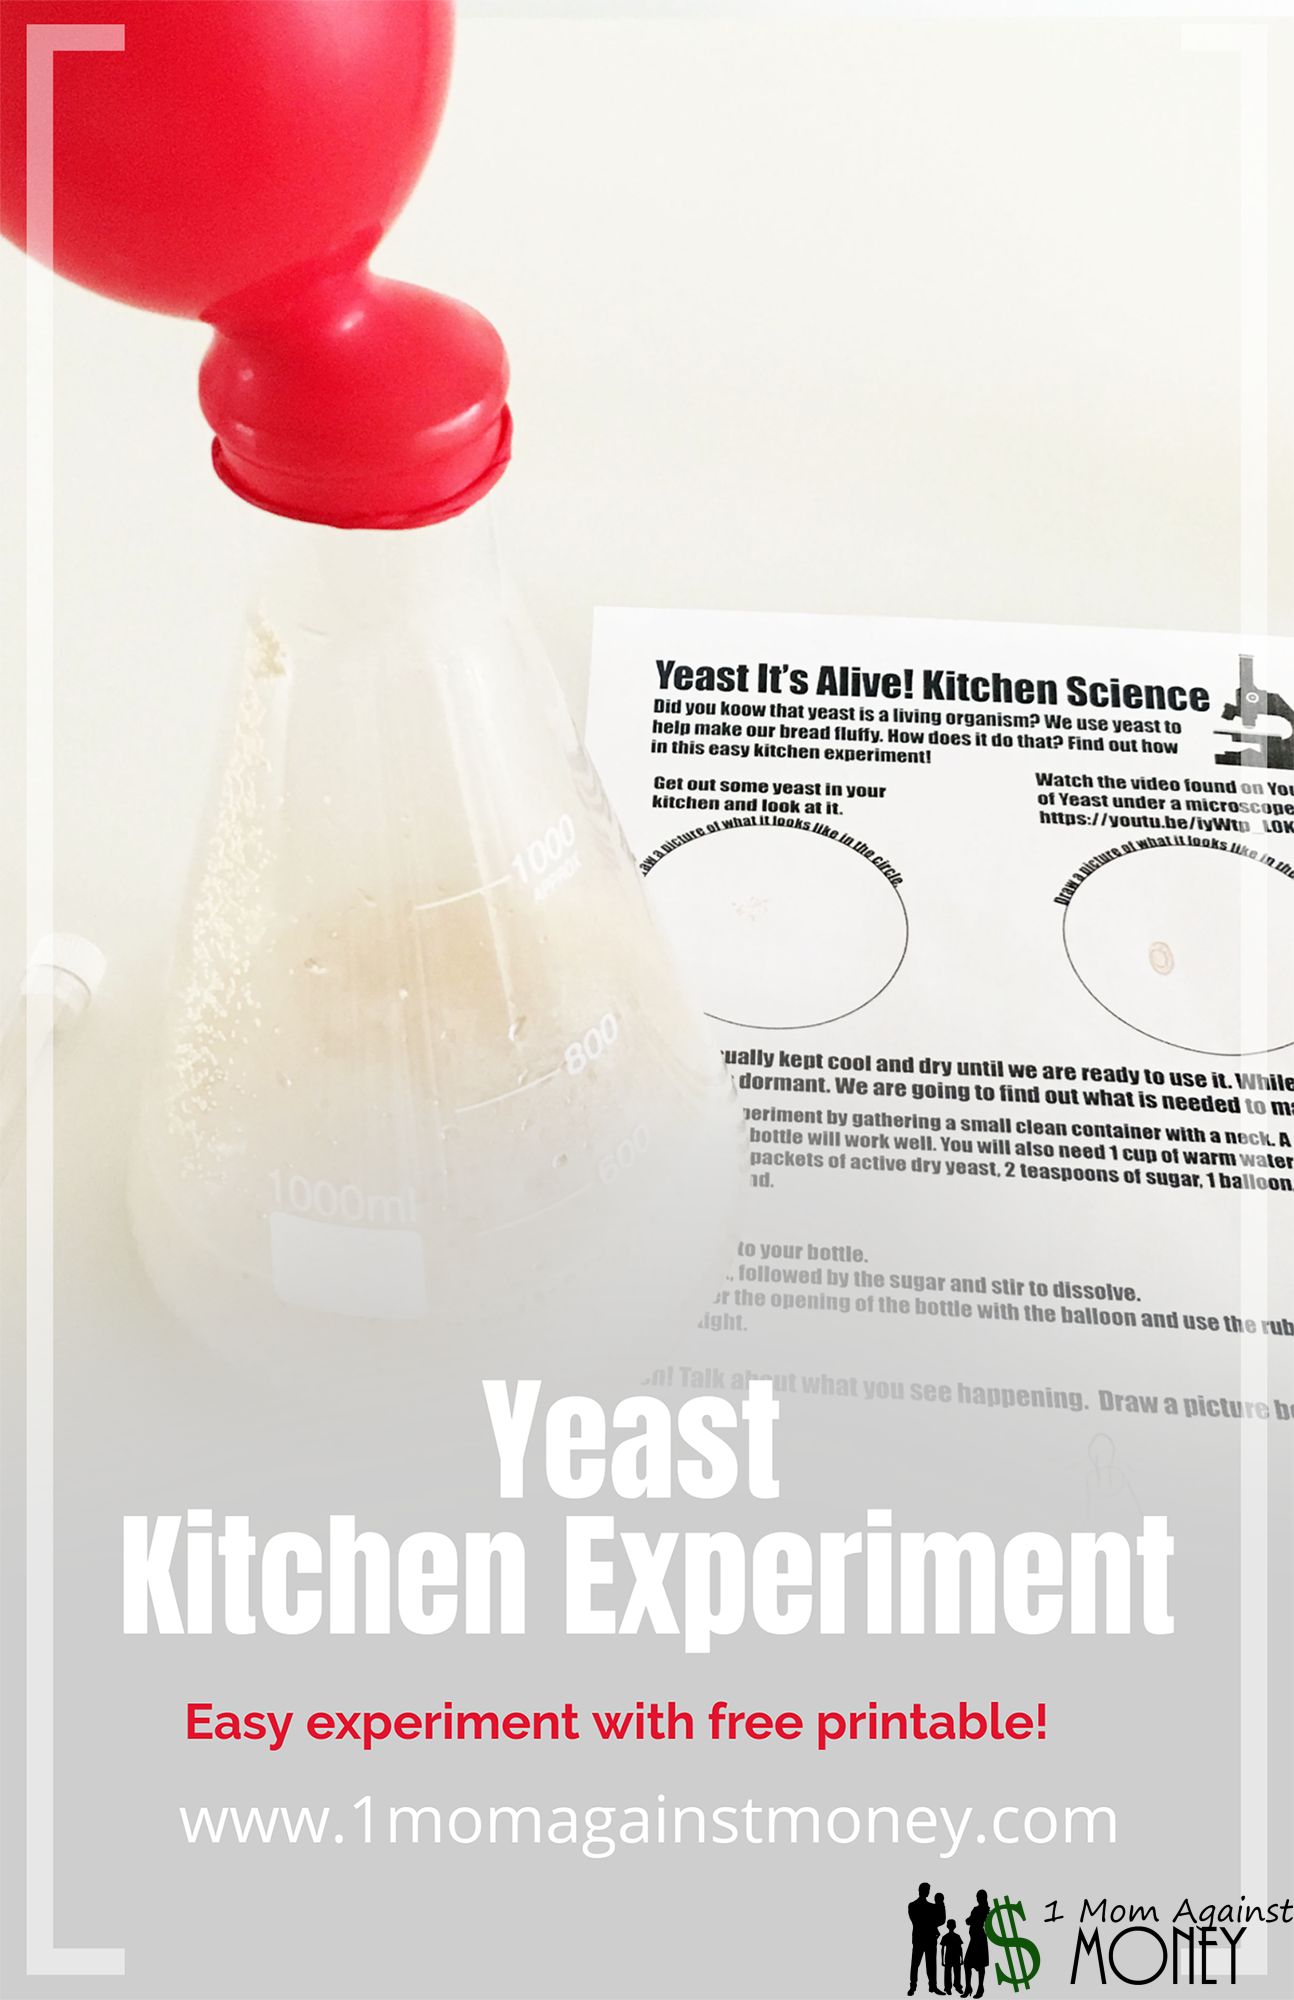 Yeast It's Alive! Kitchen Science